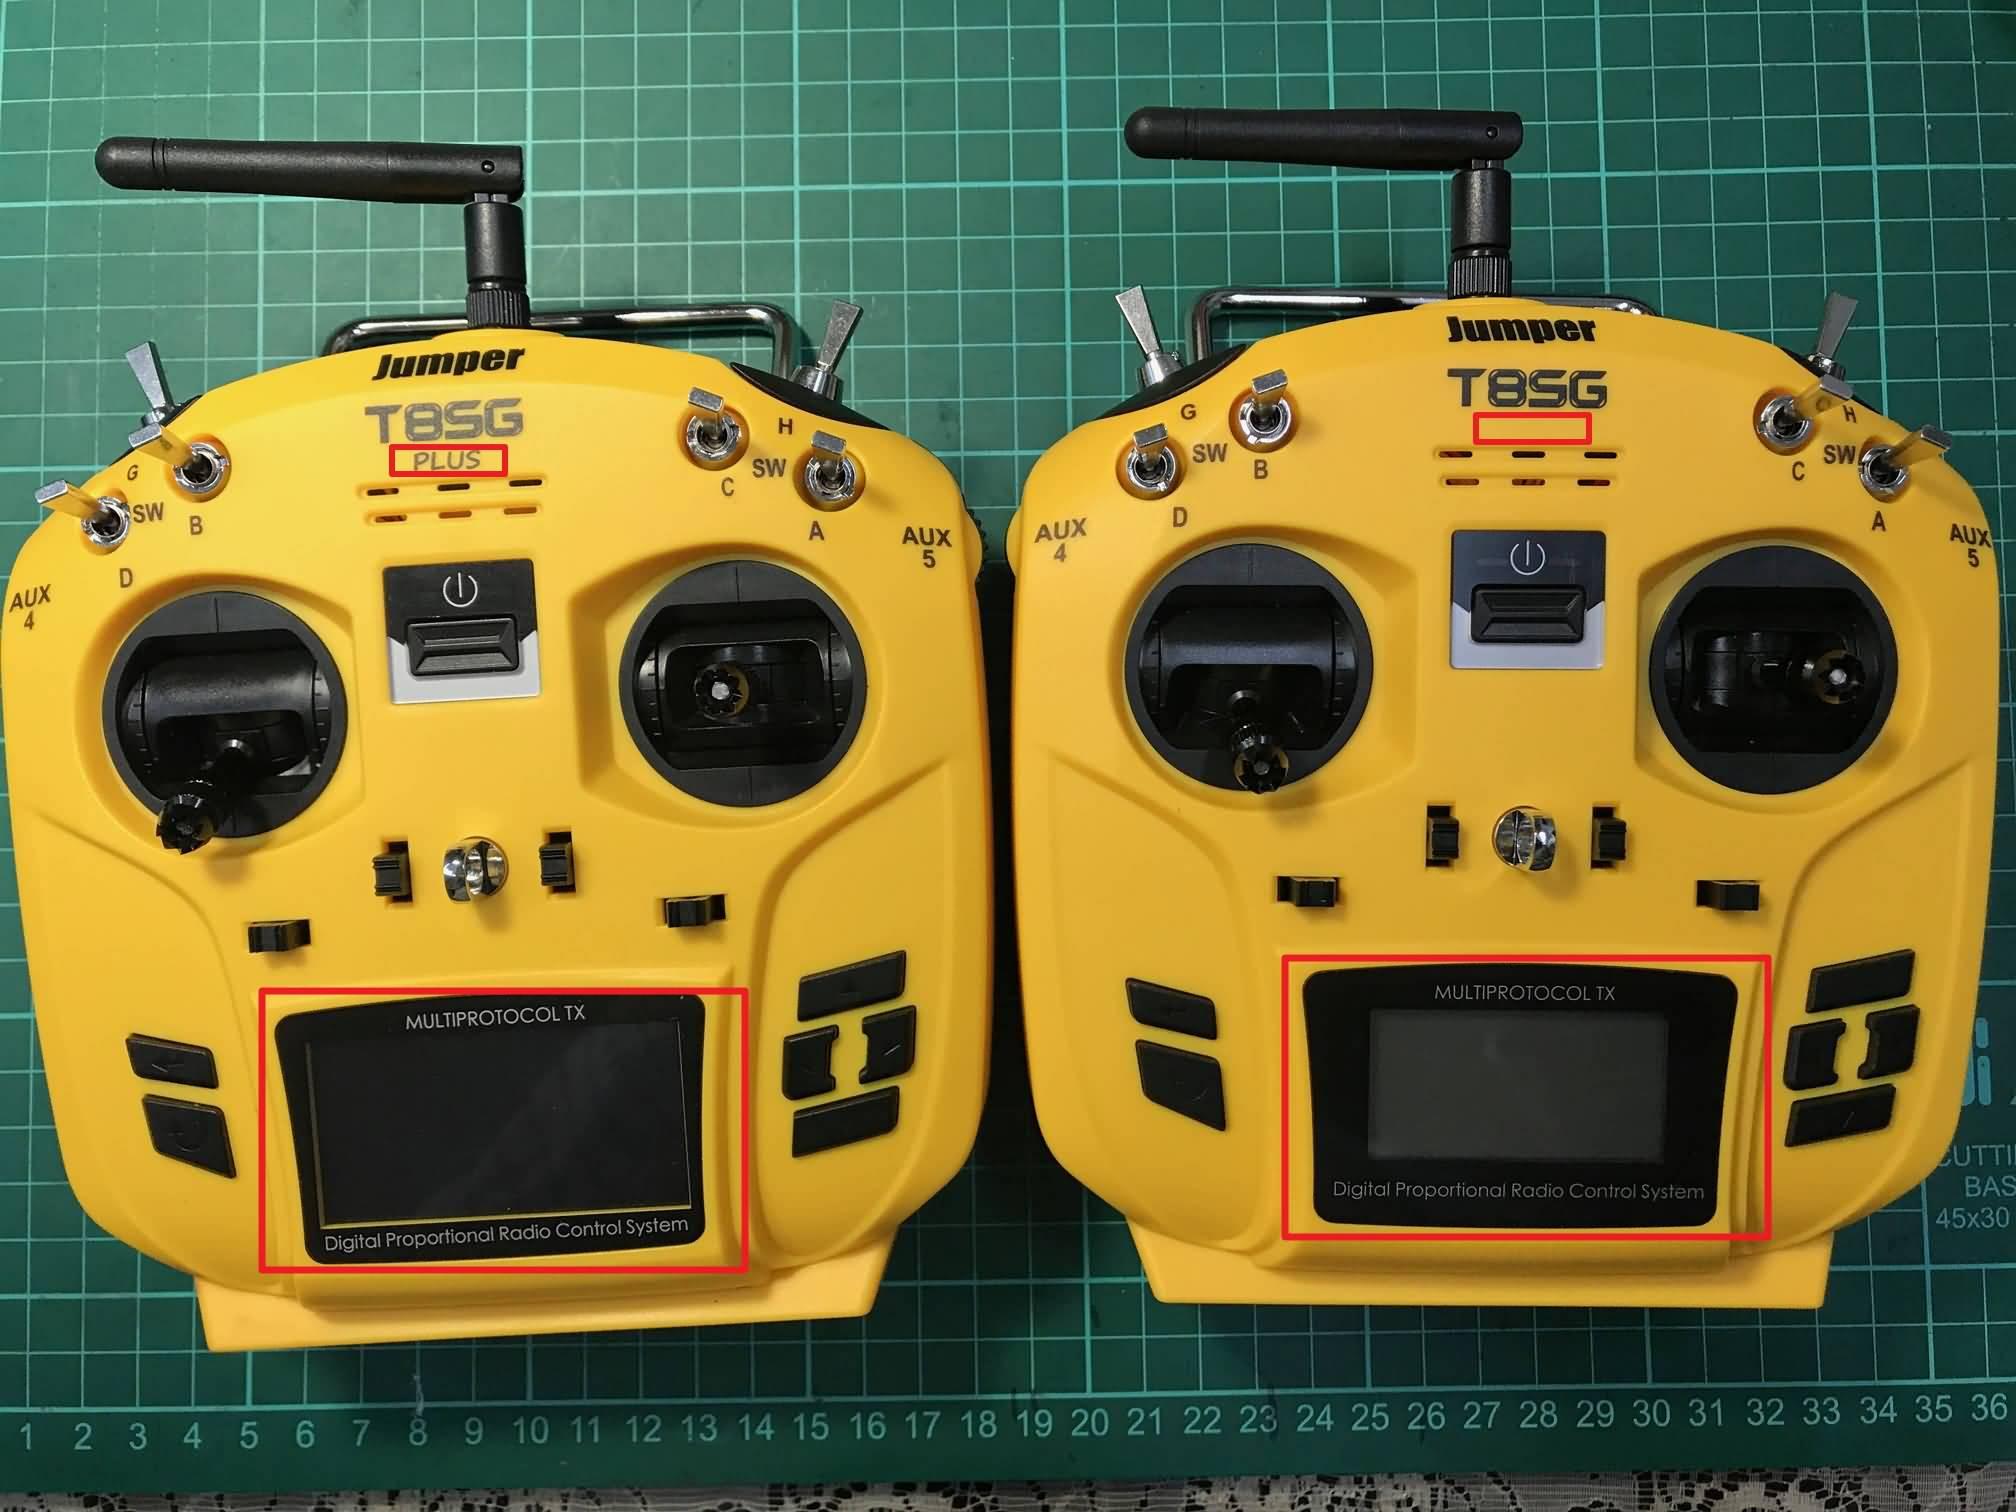 T8SG-V2plus-01.jpg